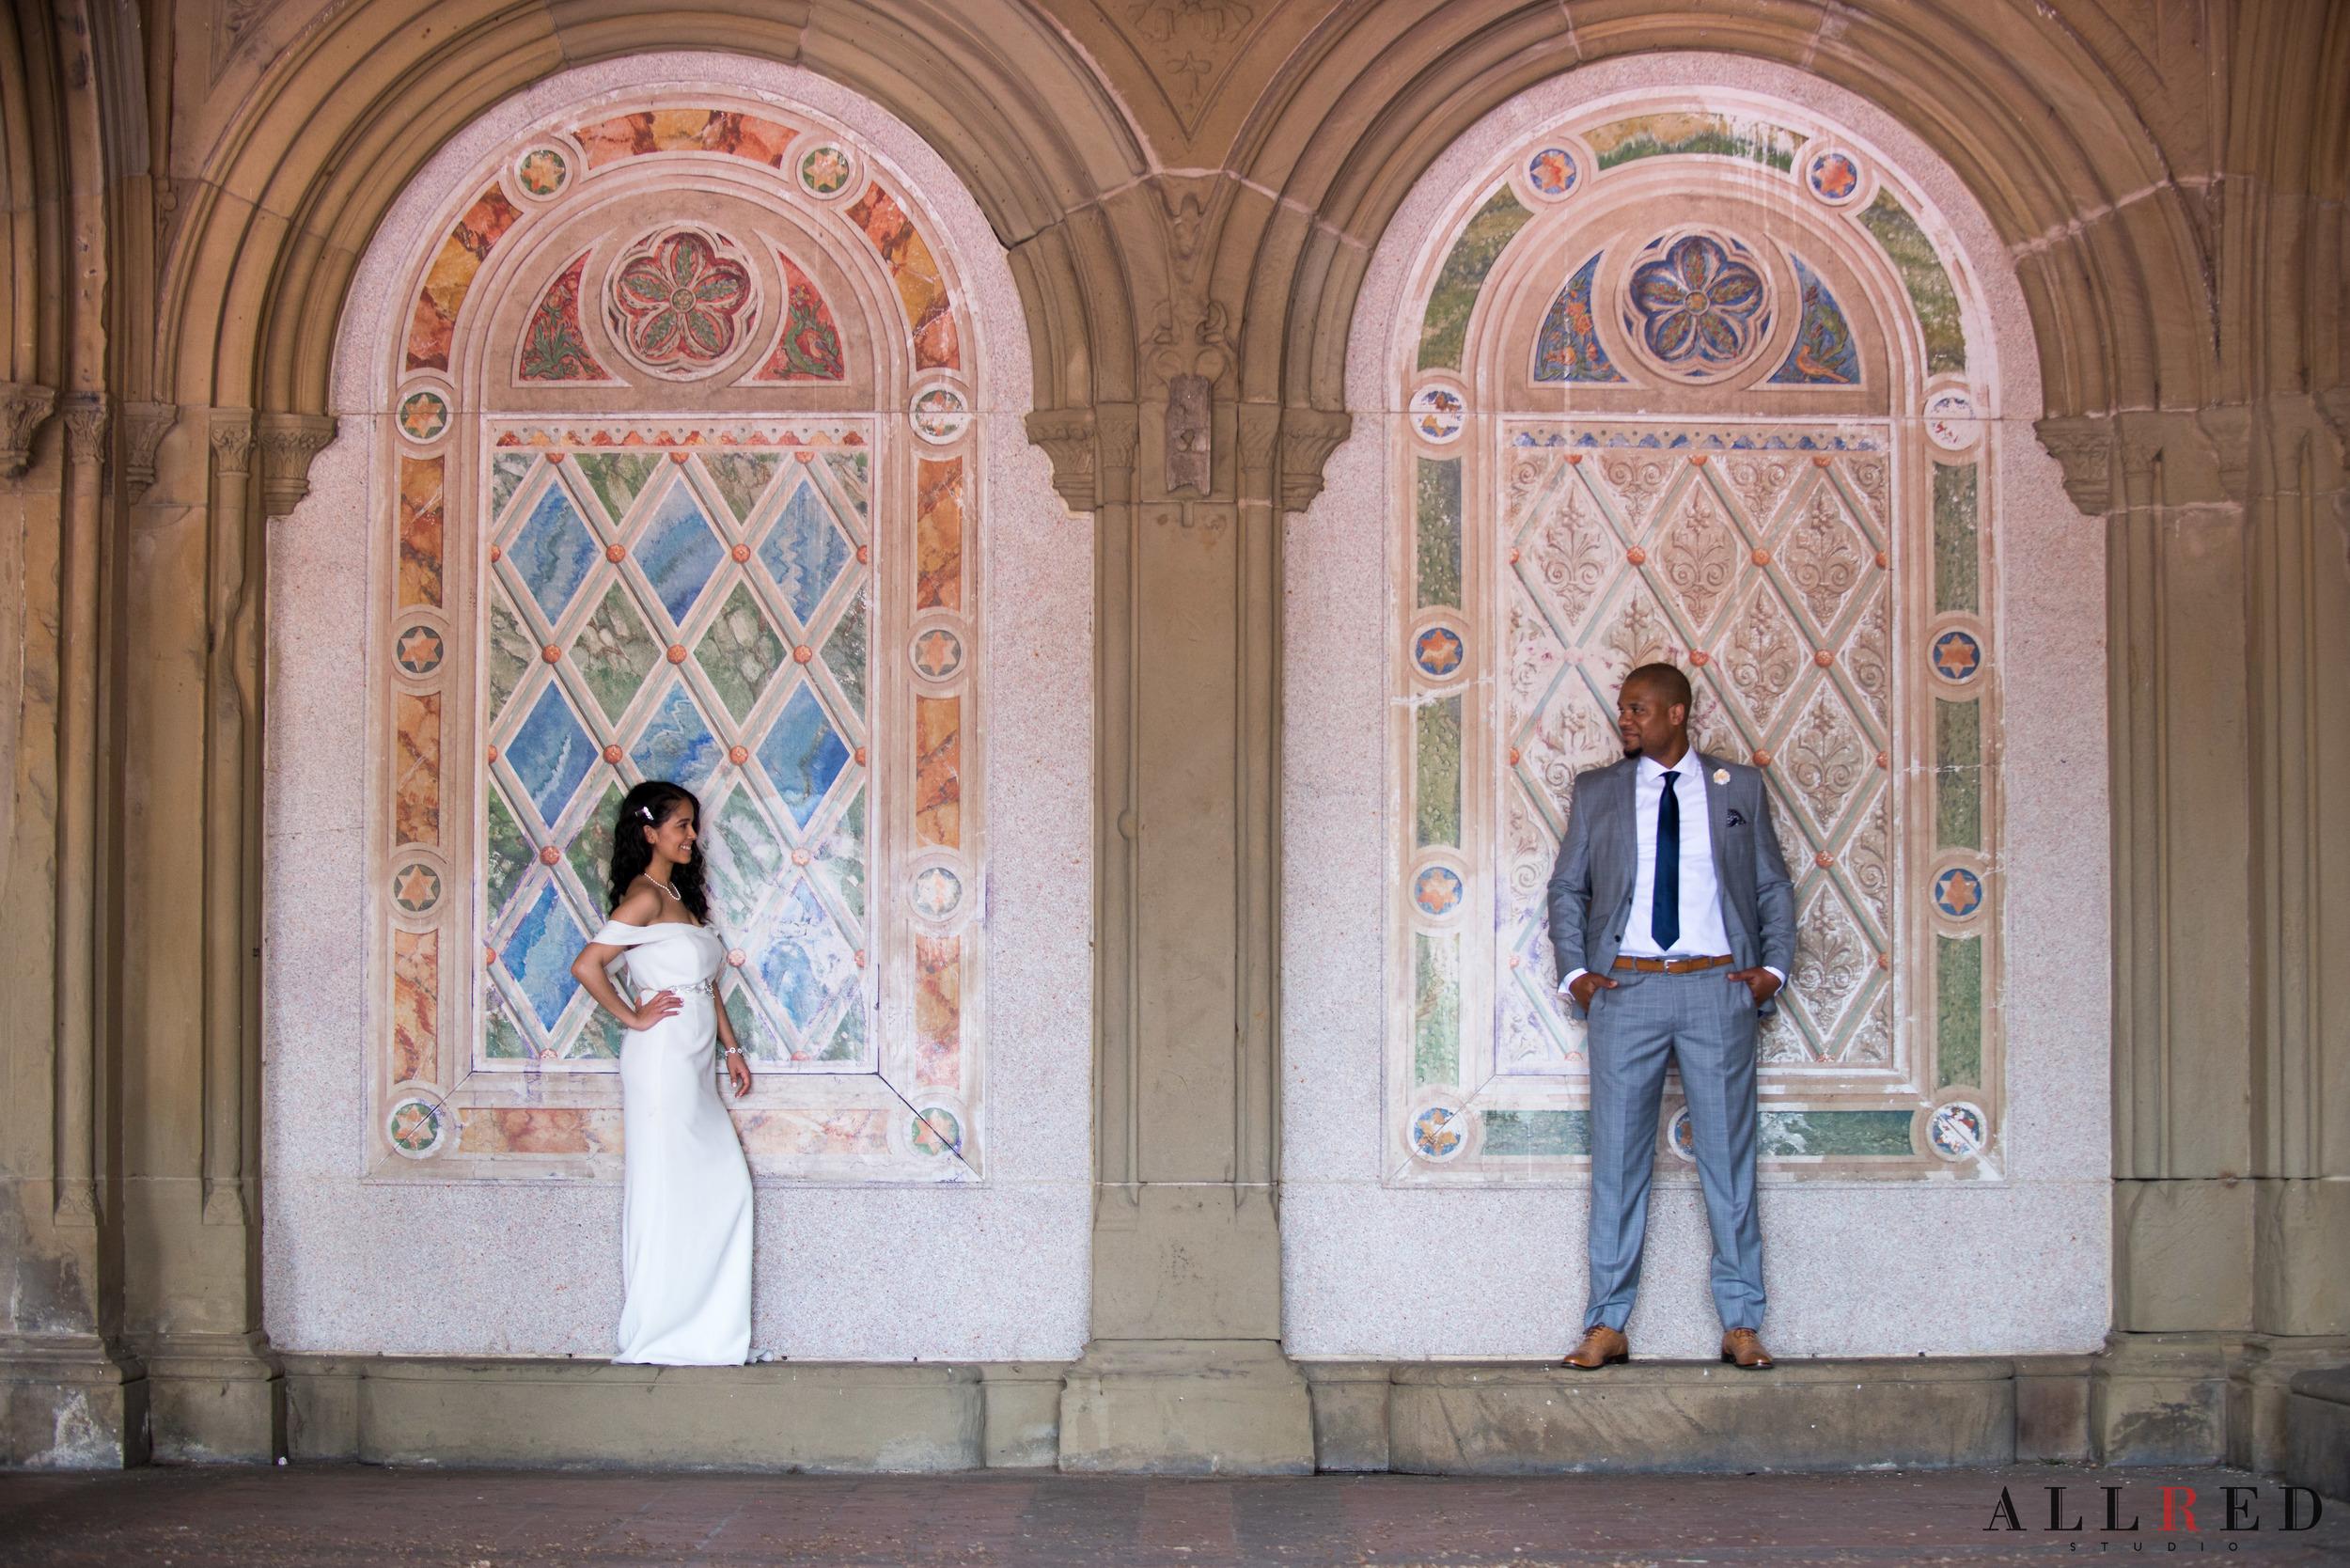 Wedding-central-park-allred-studio-new-york-photographer-new-jersey-hudson-valley-2601.jpg